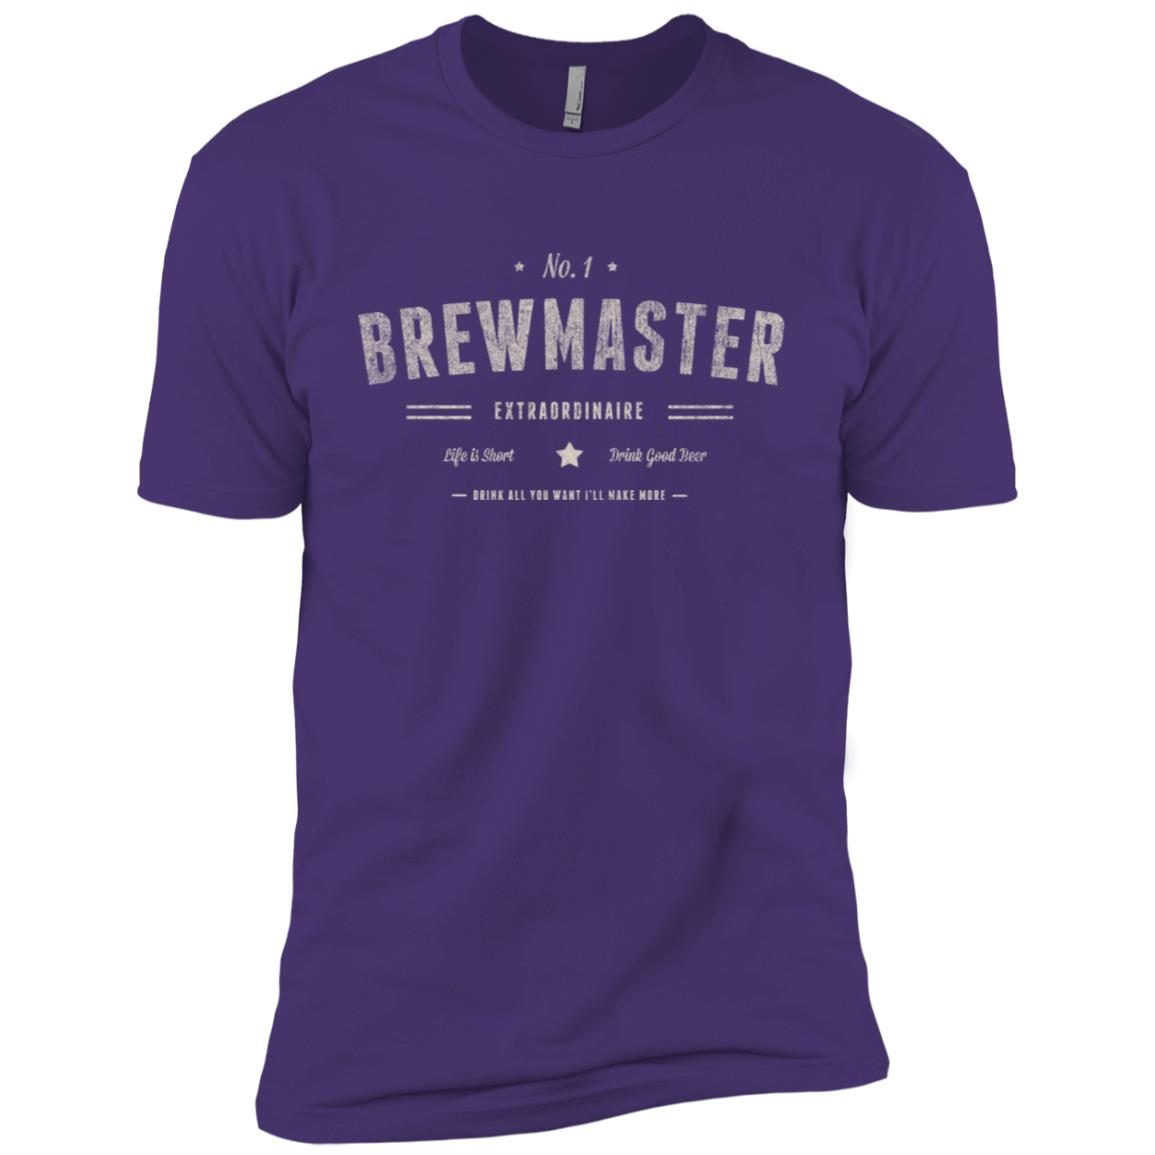 Brewmaster Extraordinaire Beer Brewer Men Short Sleeve T-Shirt